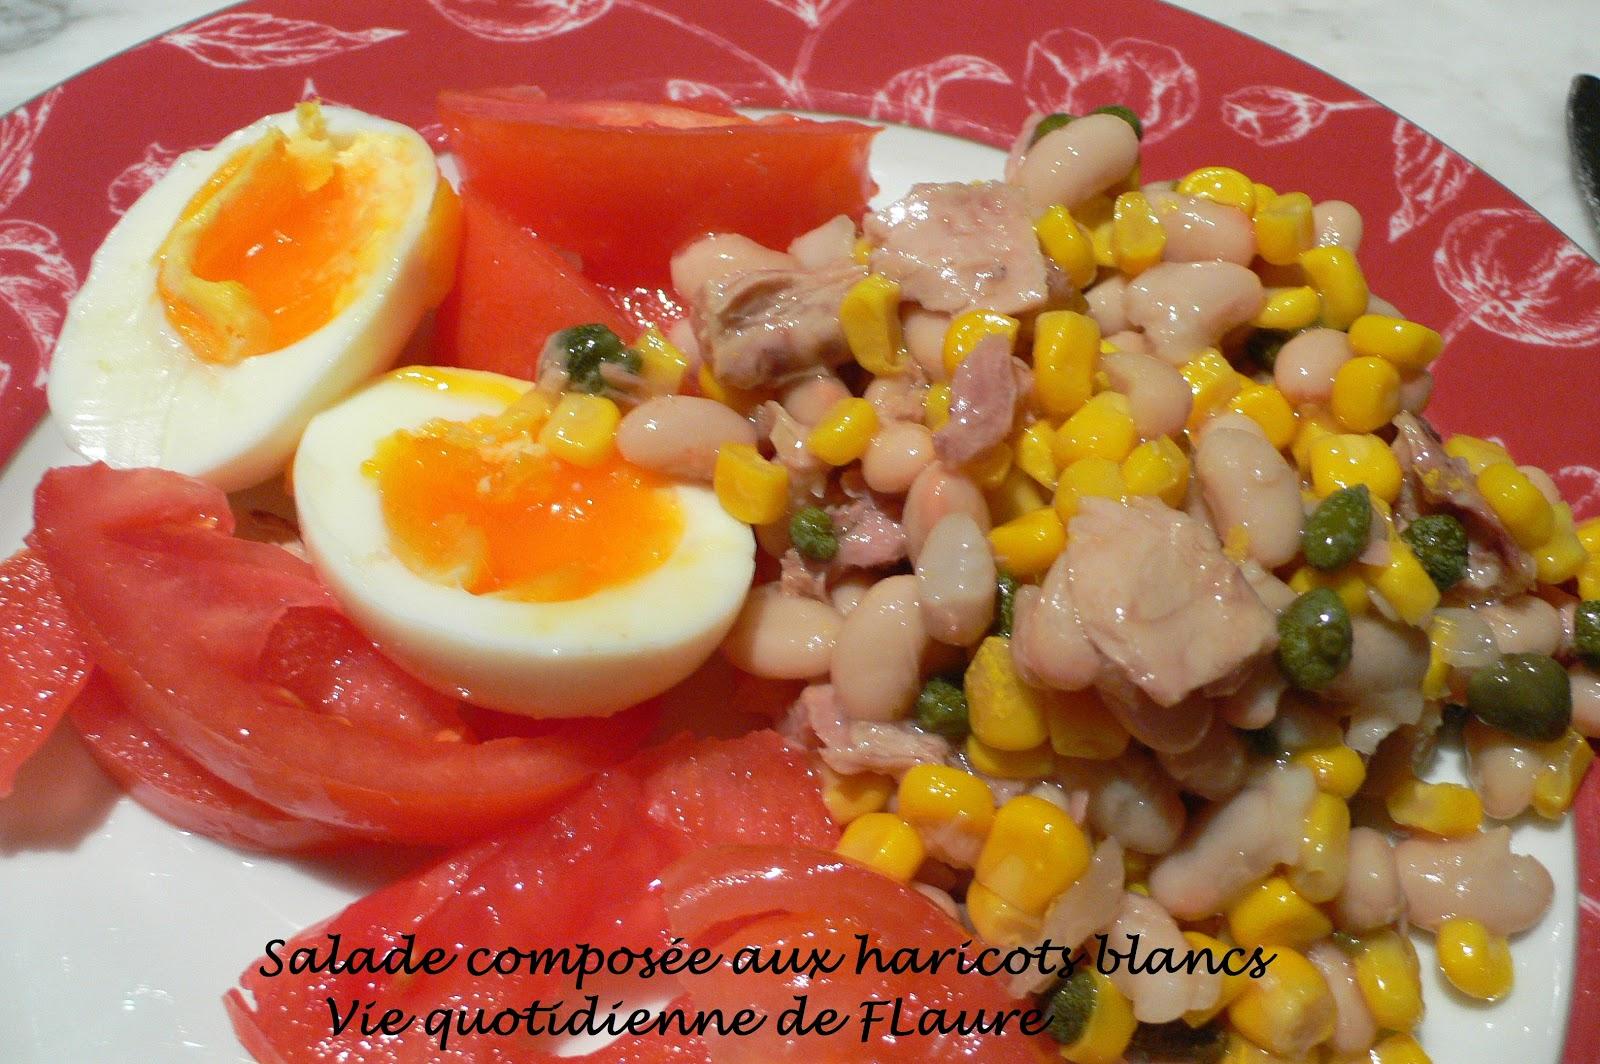 salade compose aux haricots blancs